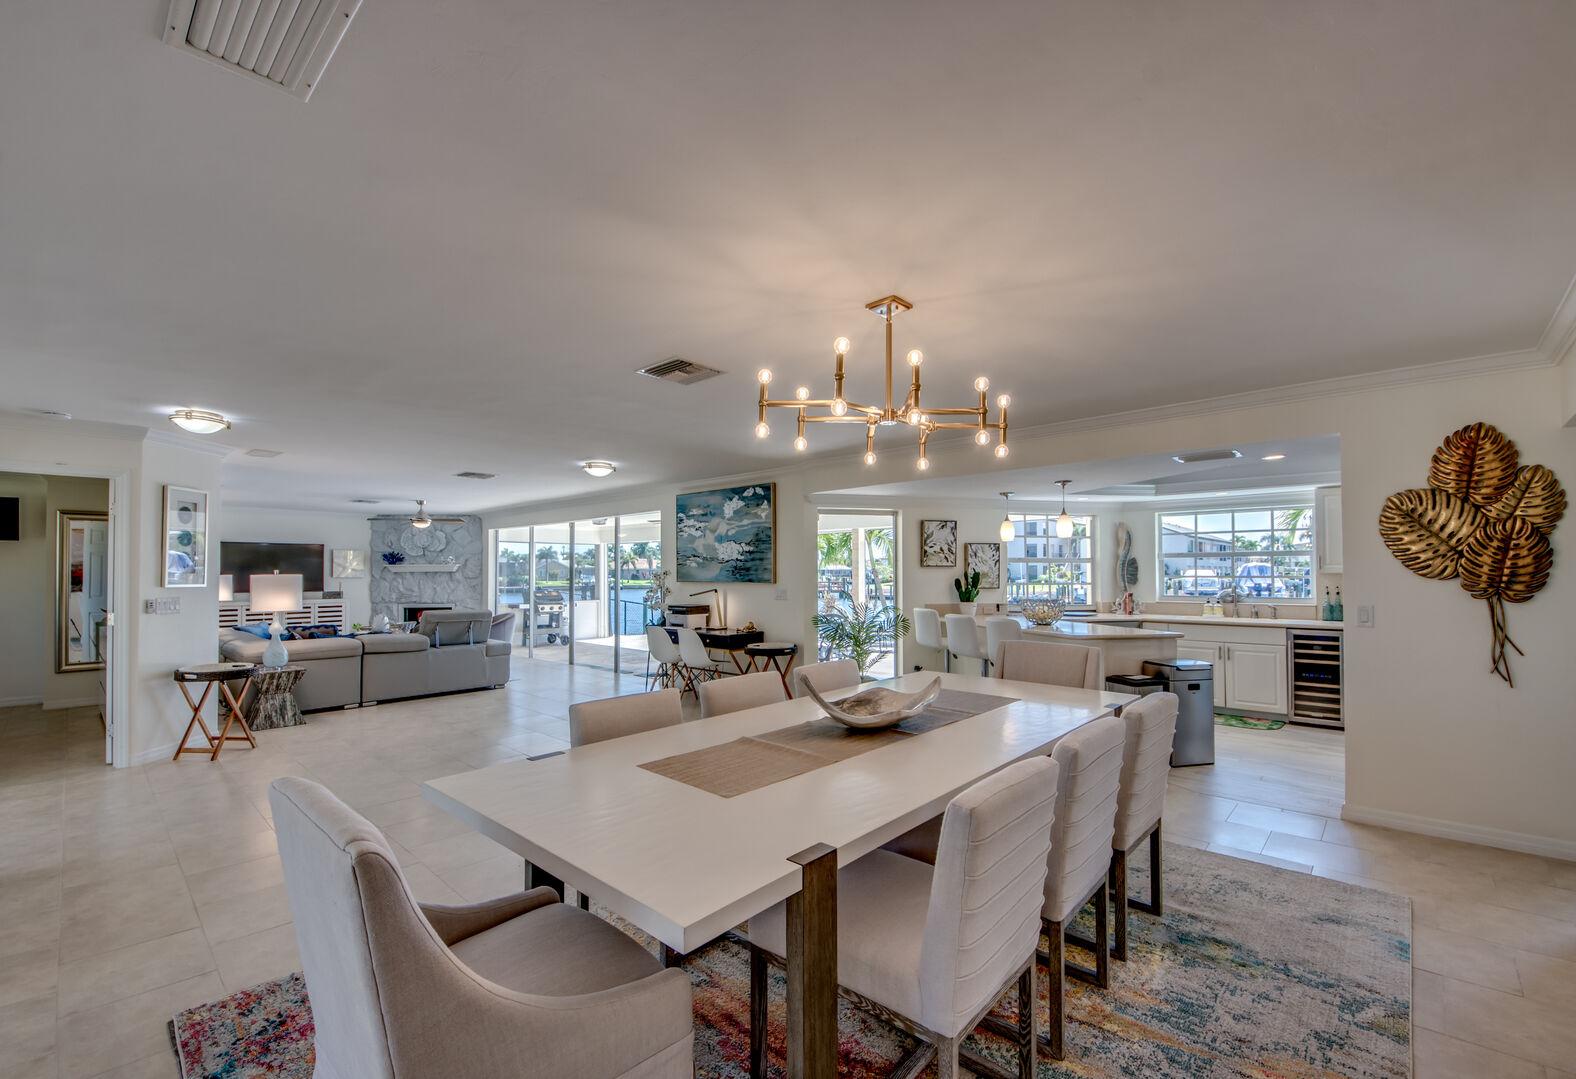 Roelens Vacation Rentals Villa Everlasting Sunshine Cape